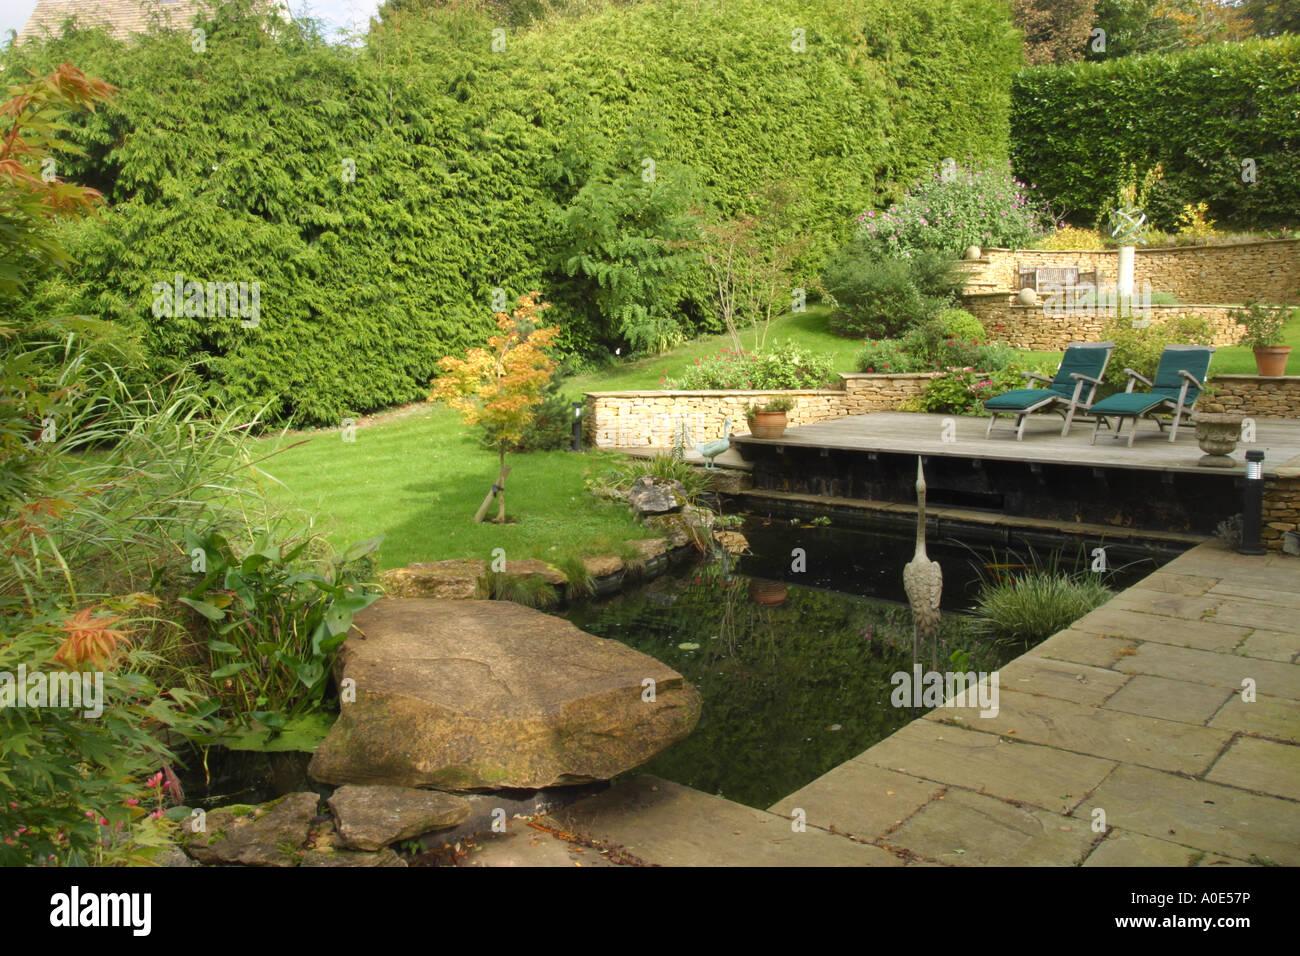 Seating Area Around Pond In Modern Mediterranean Style: Modern Style Garden Pond And Wood Decking Seating Area